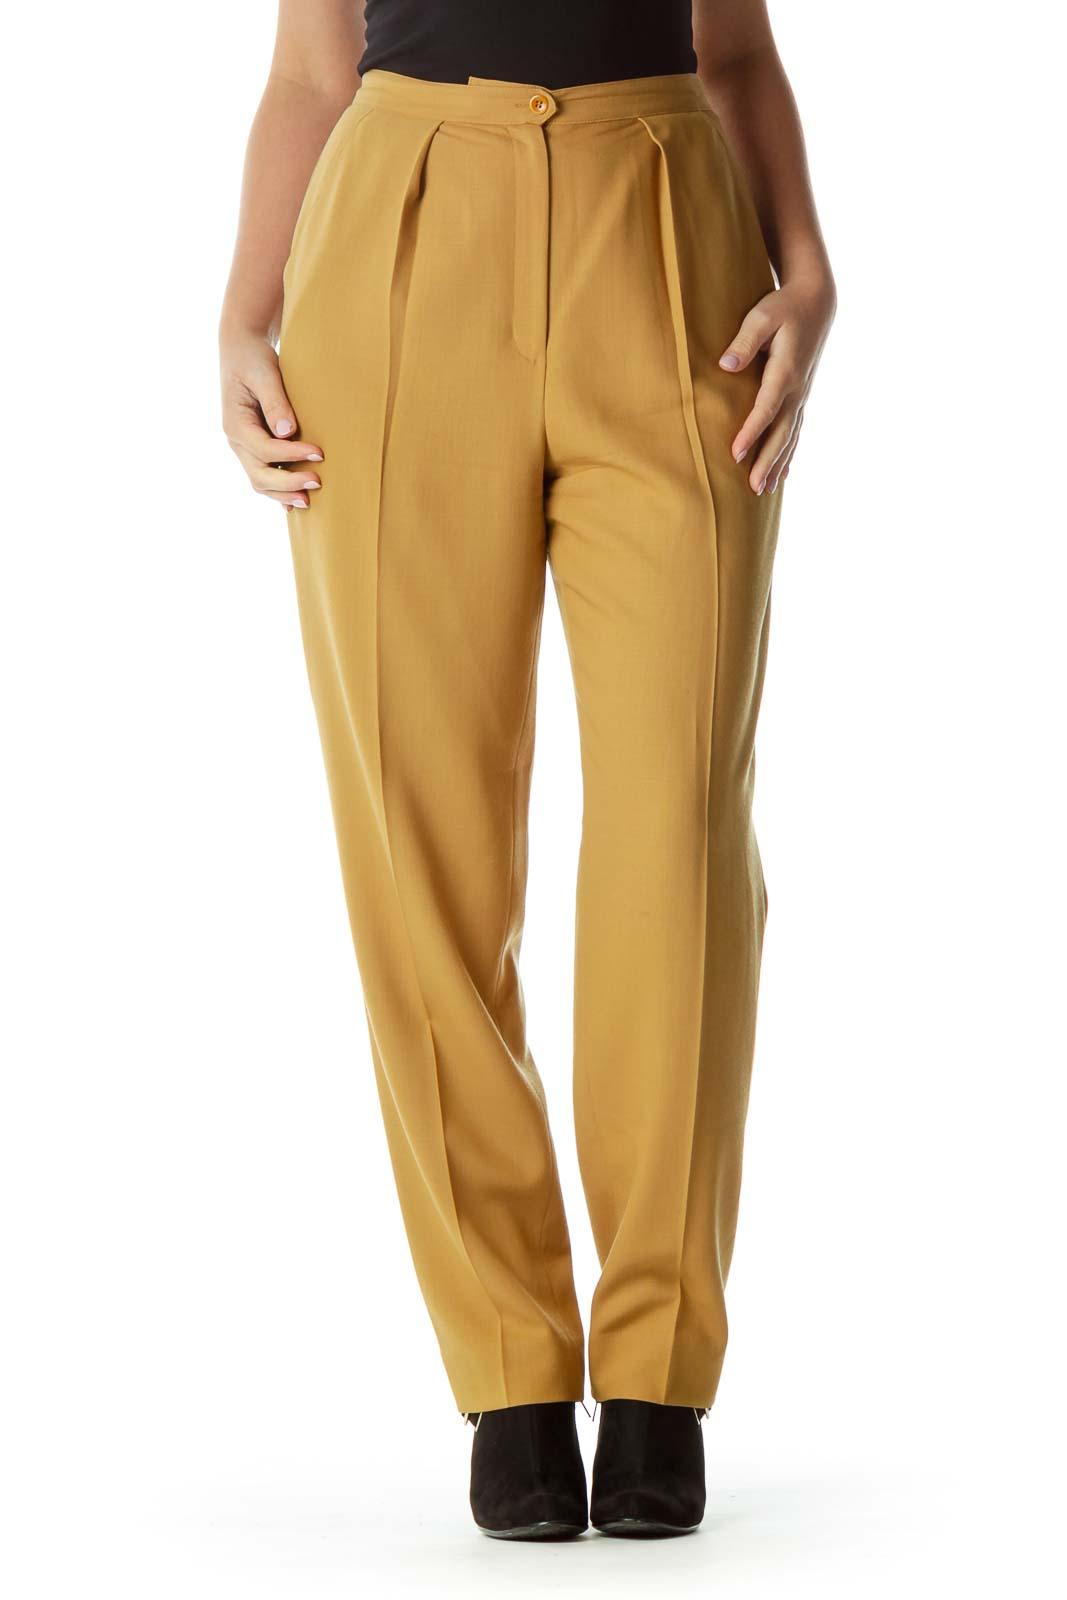 Mustard Yellow Pleated Wool Pants